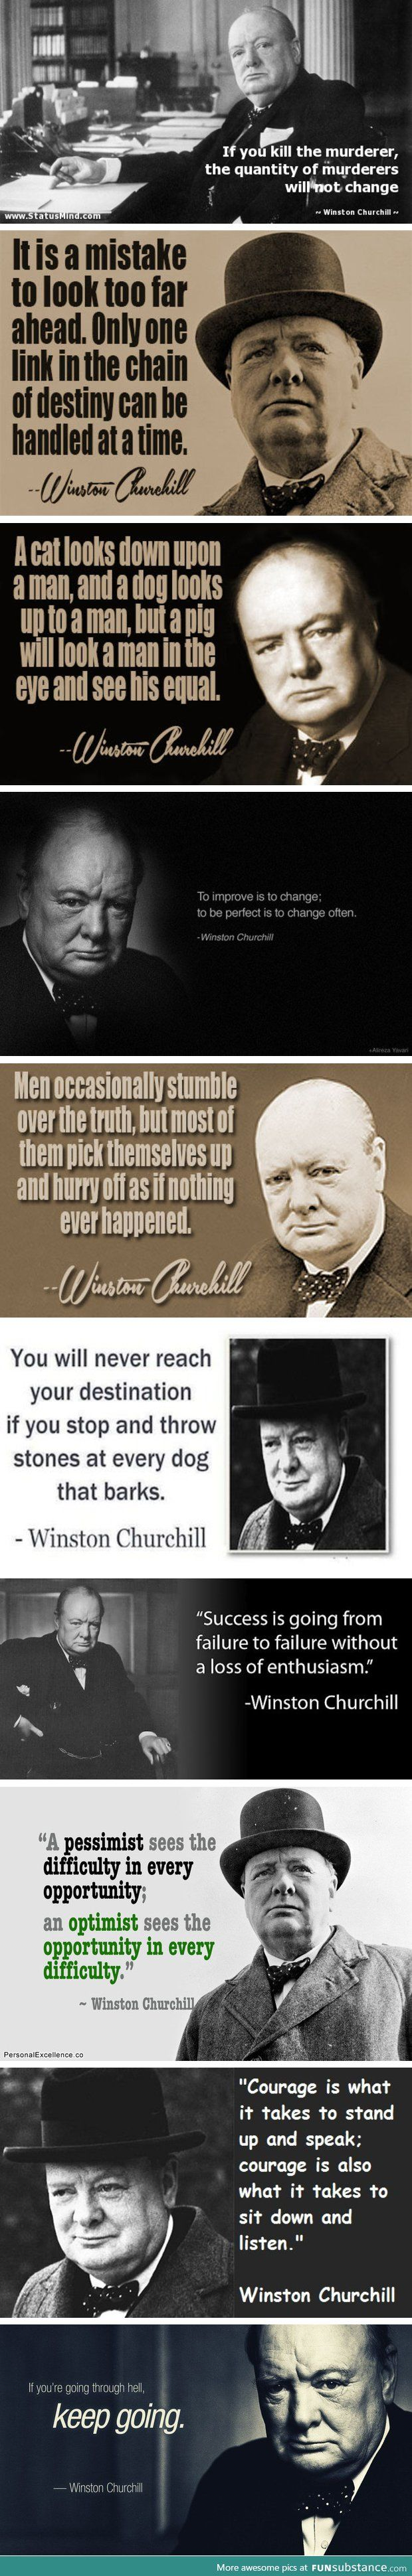 Sir Winston Churchill was a wise man